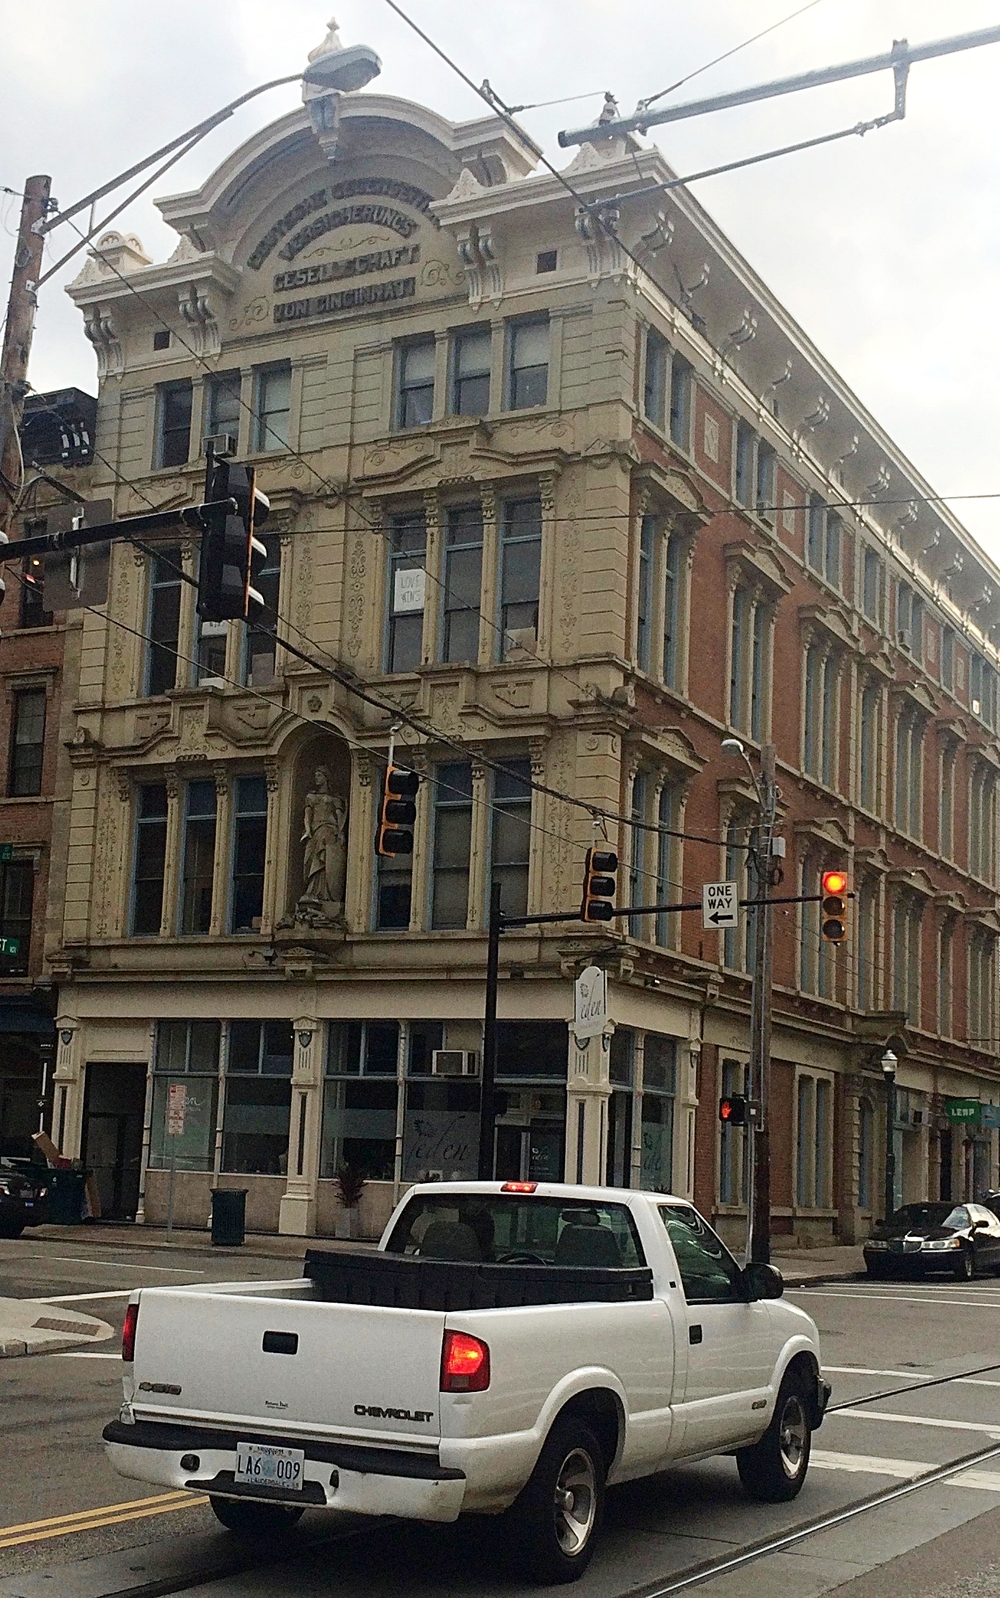 "A building with the inscription ""Deutsche Gegenseitige Versicherungs Gesellschaft von Cincinnati"" meaning ""German Re-Insurance Company of Cincinnati"" (Photo by B. Wing)"